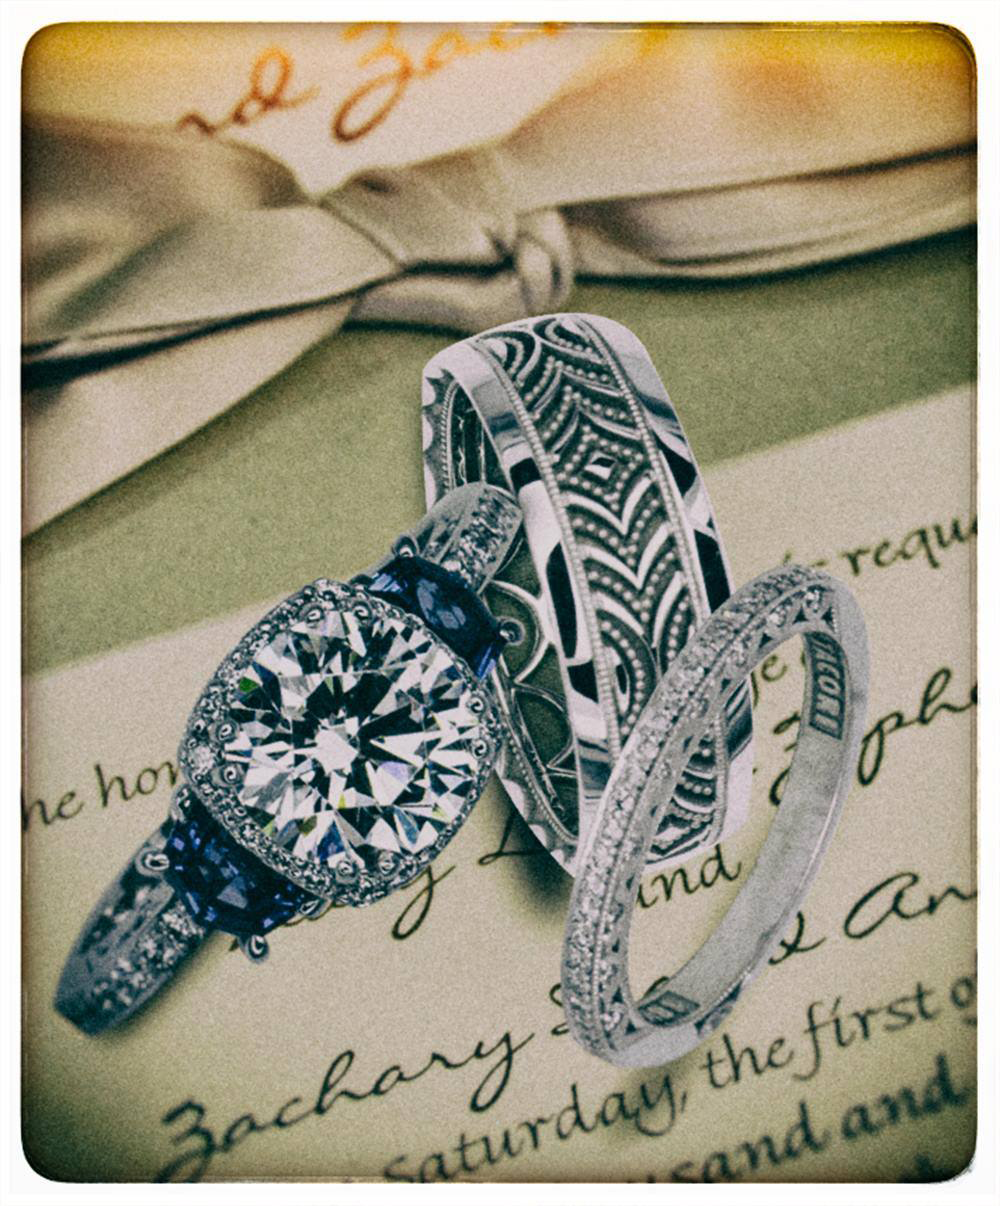 Wedding Rings - Harrison Baker Photography